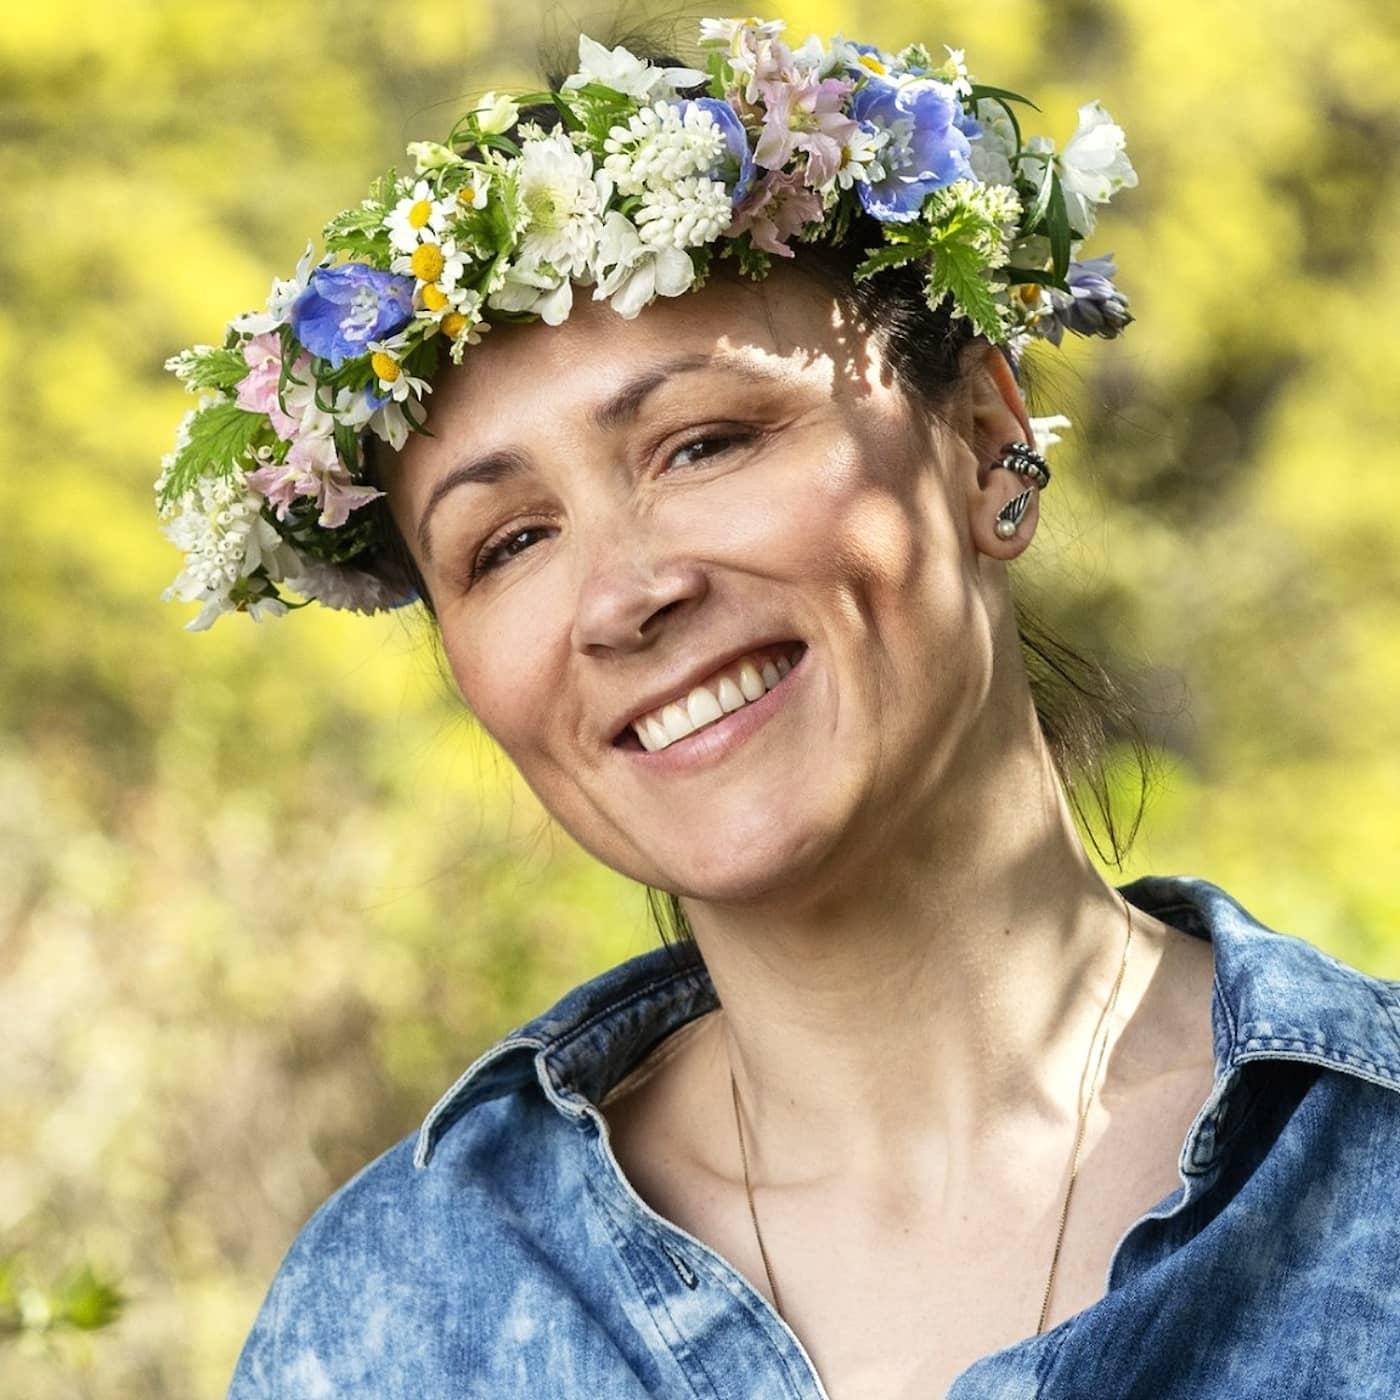 Lisen Bratt Fredricson